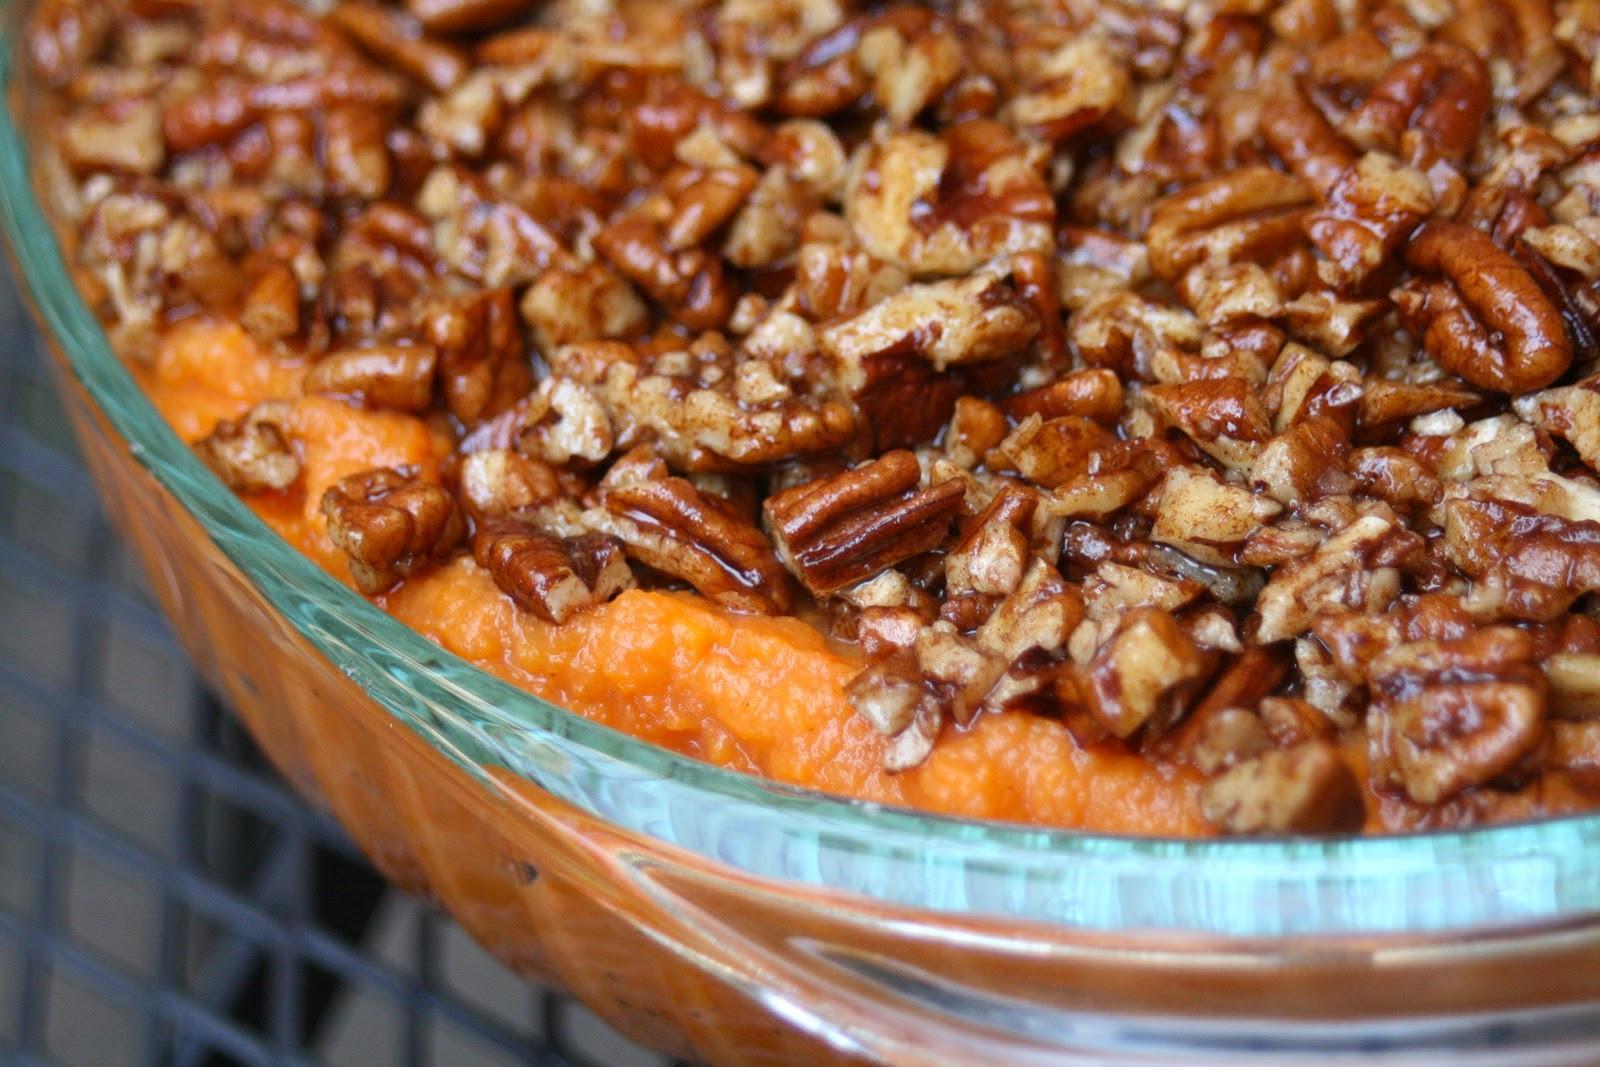 Paleo Thanksgiving Sweet Potatoes  Paleo Diet Recipes Paleo Sweet Potato Casserole and the